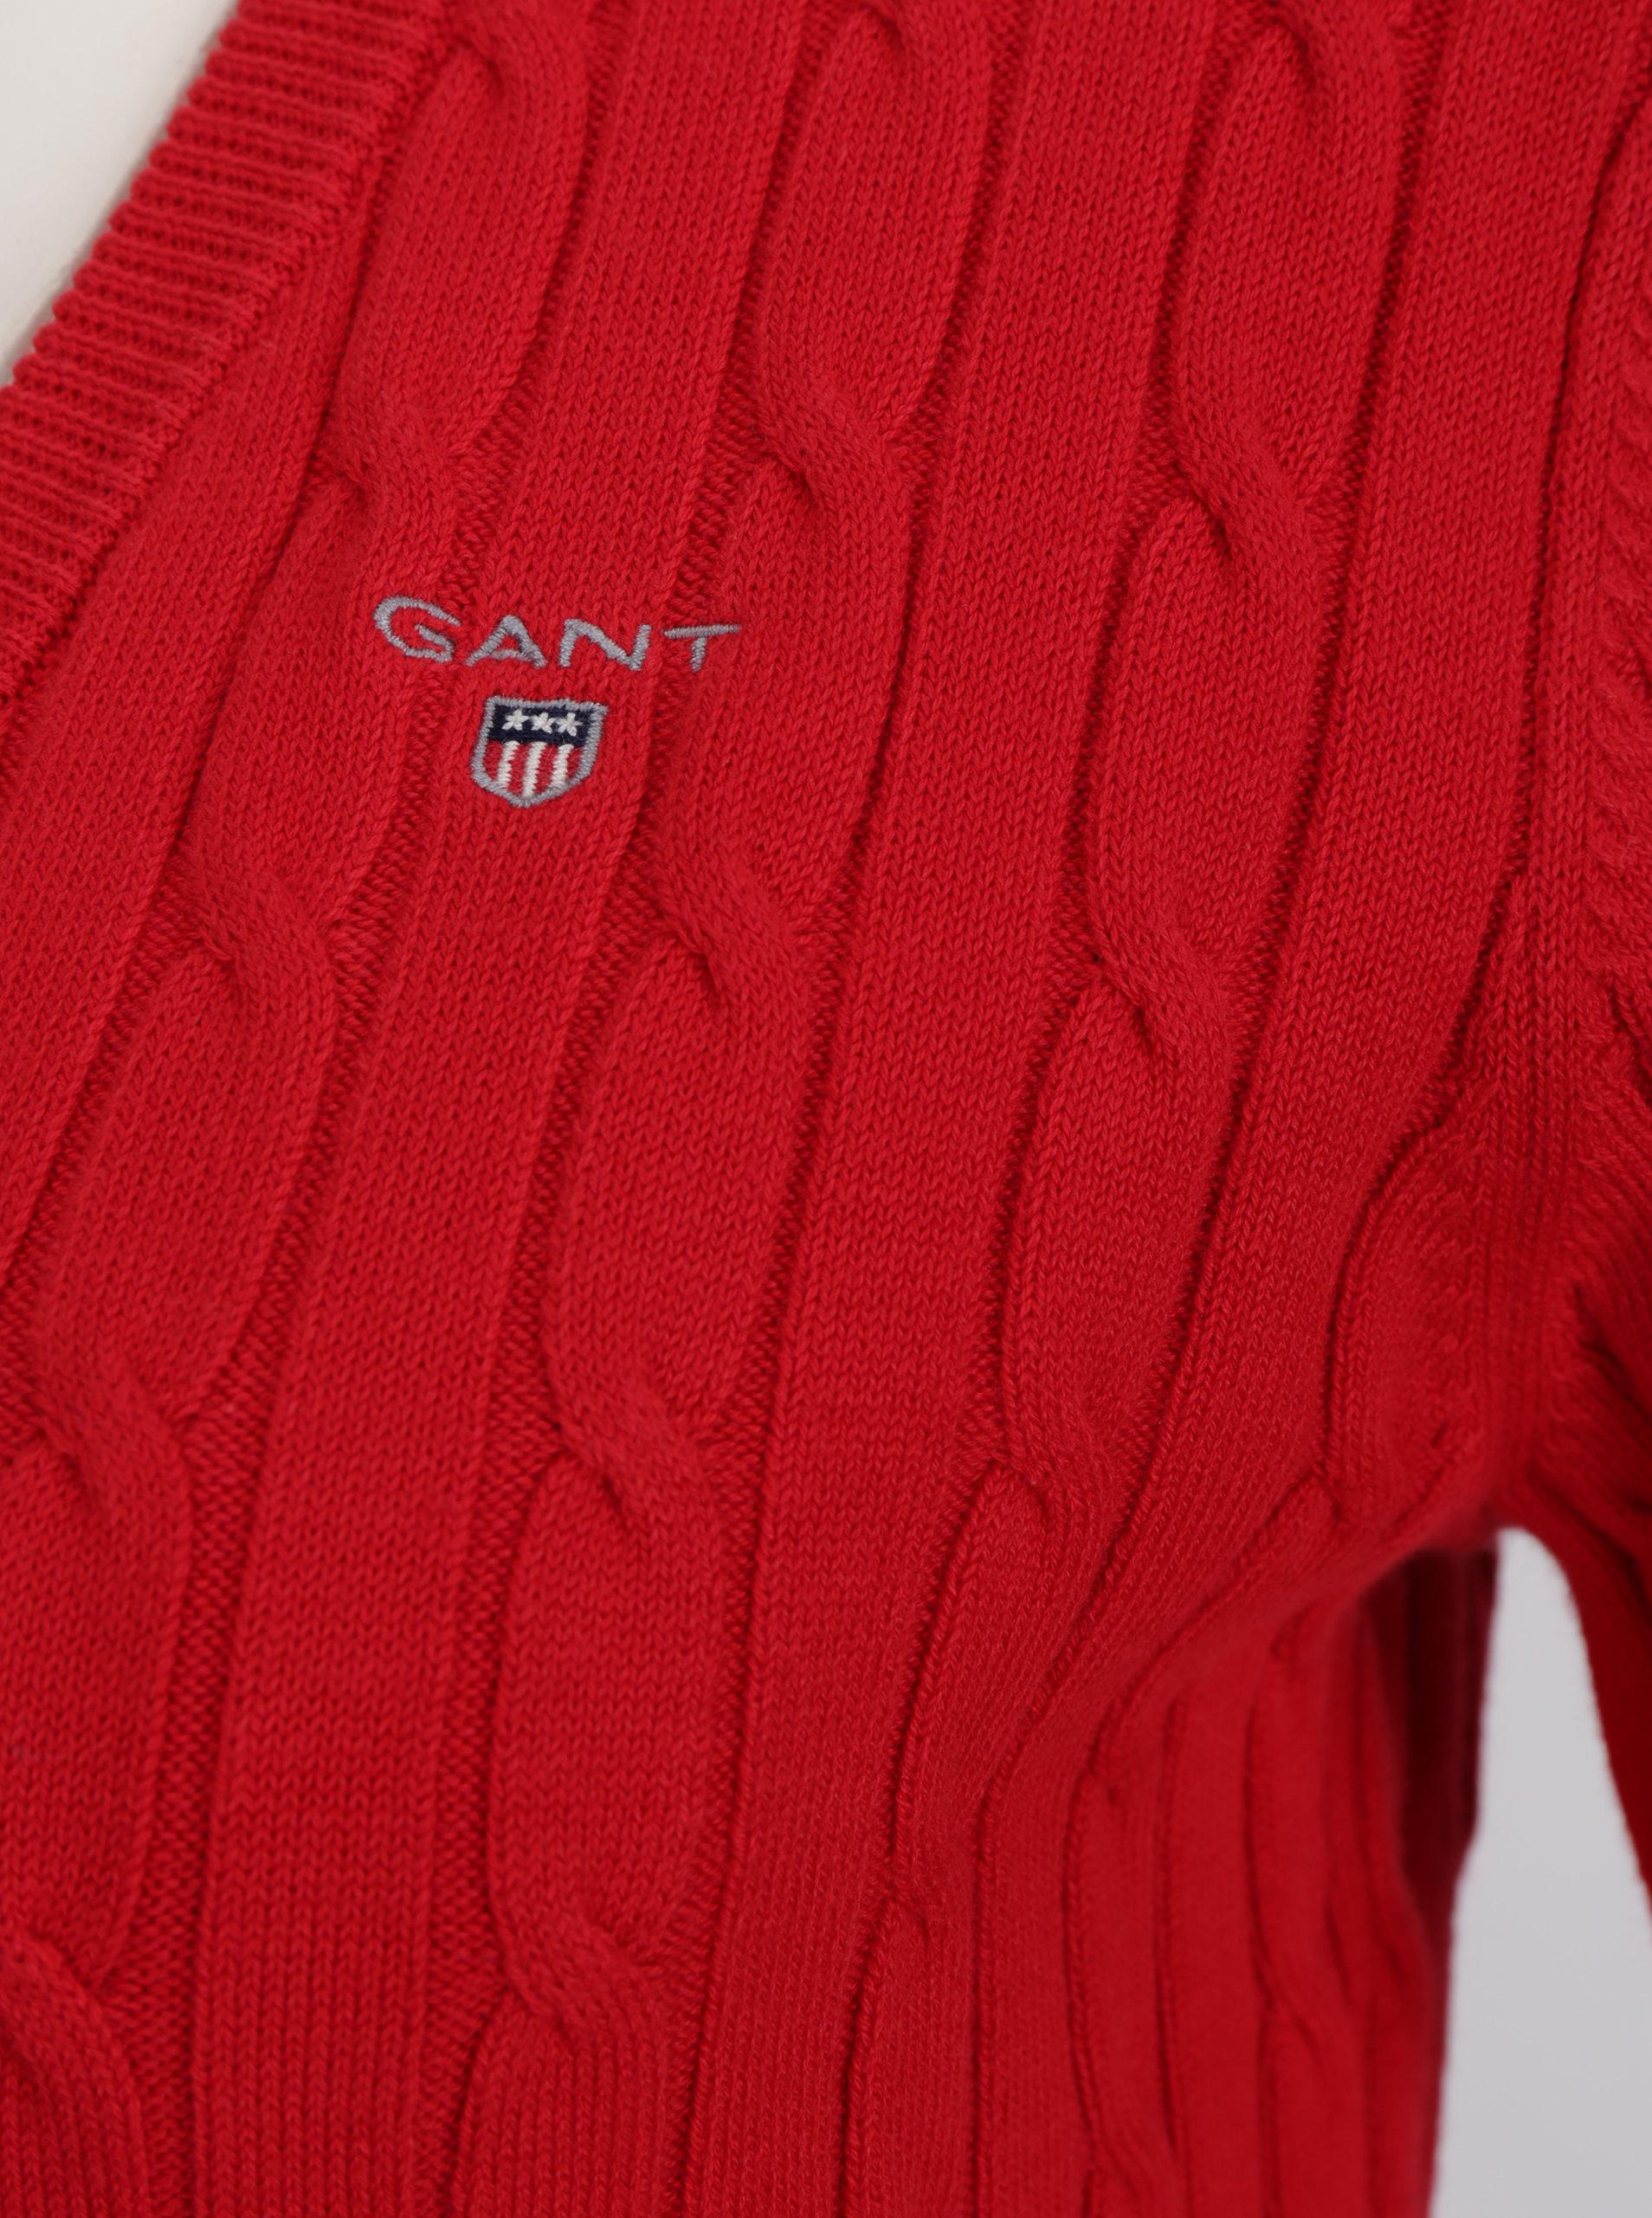 3856ea94d277 Červený dámsky sveter s véčkovým výstrihom GANT ...